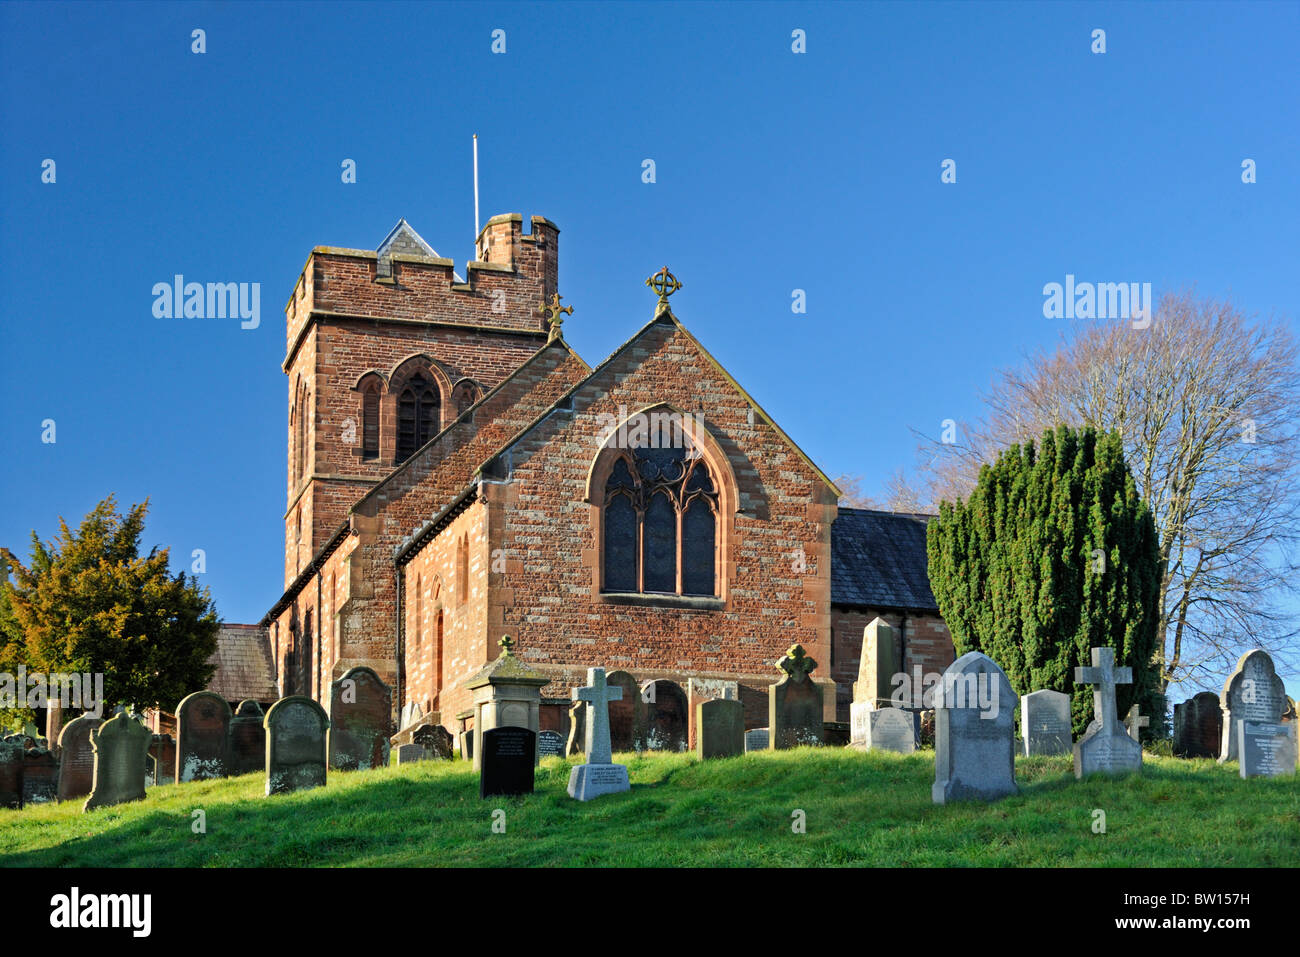 Church of Saint Nicholas. Lazonby, Cumbria, England, United Kingdom, Europe. - Stock Image